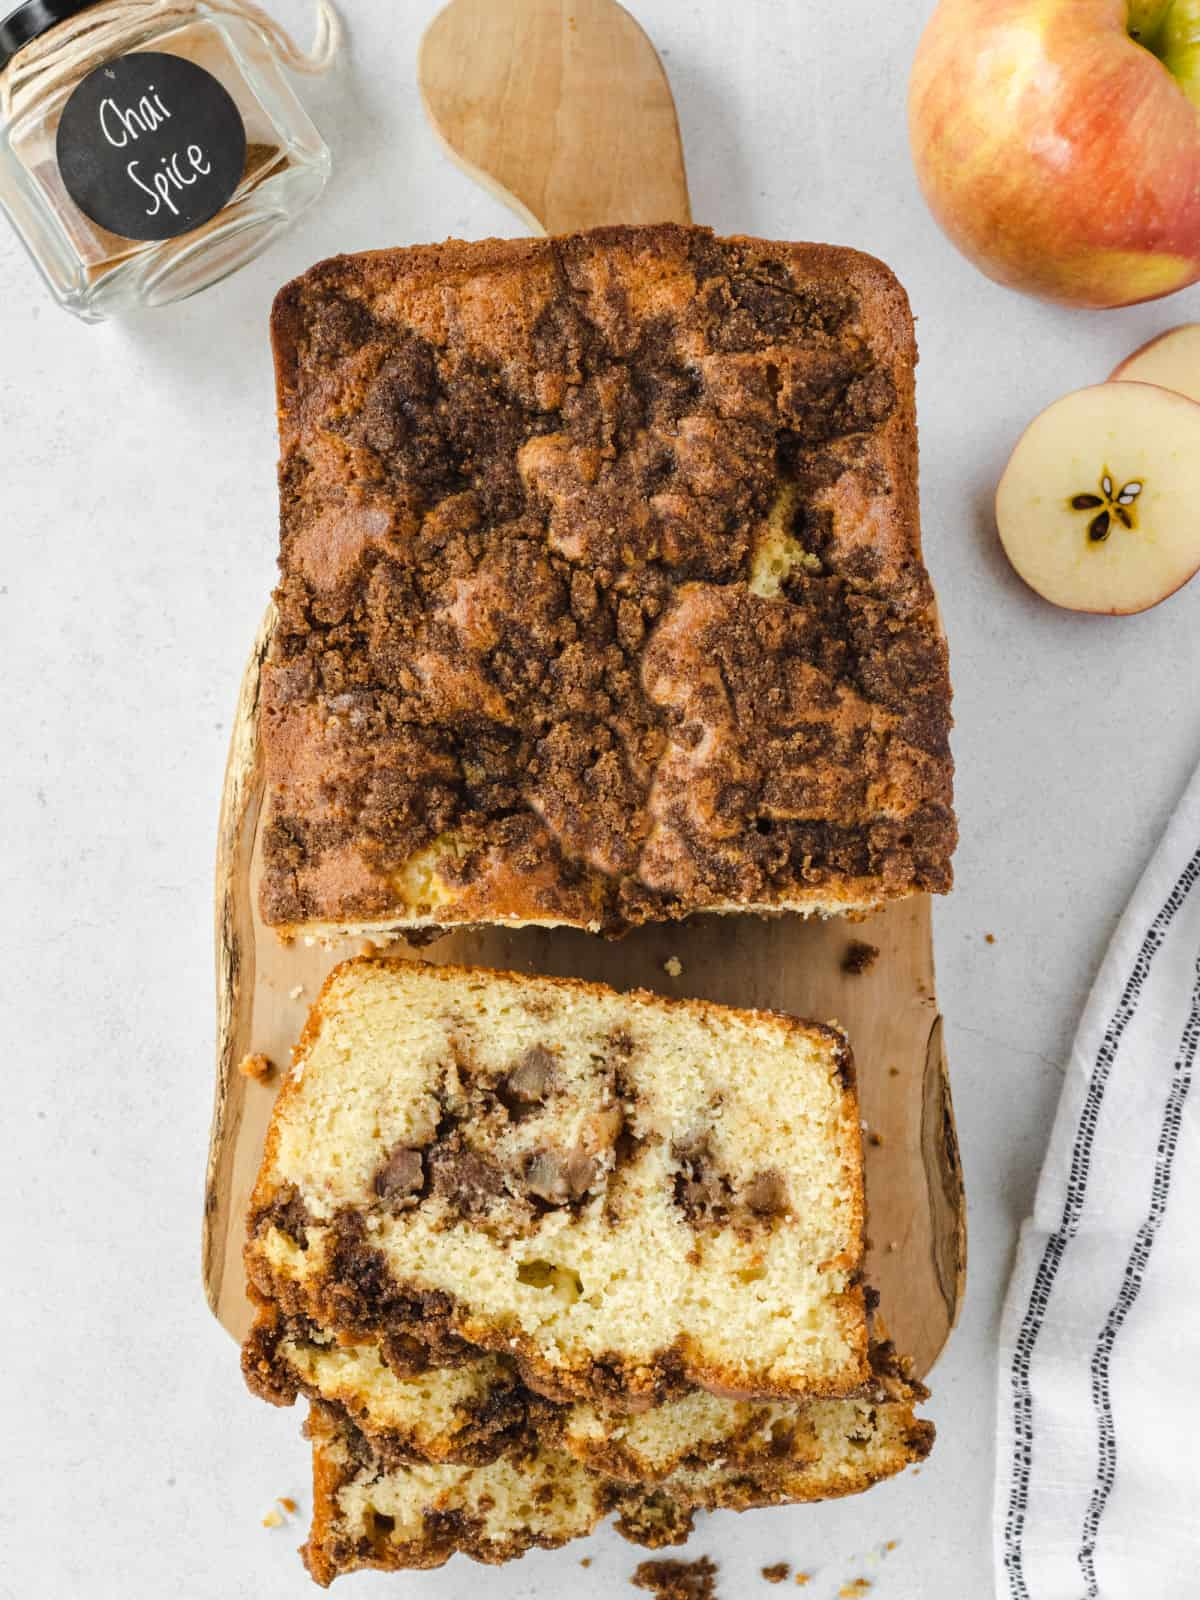 Loaf of apple chai bread sliced on cutting board.